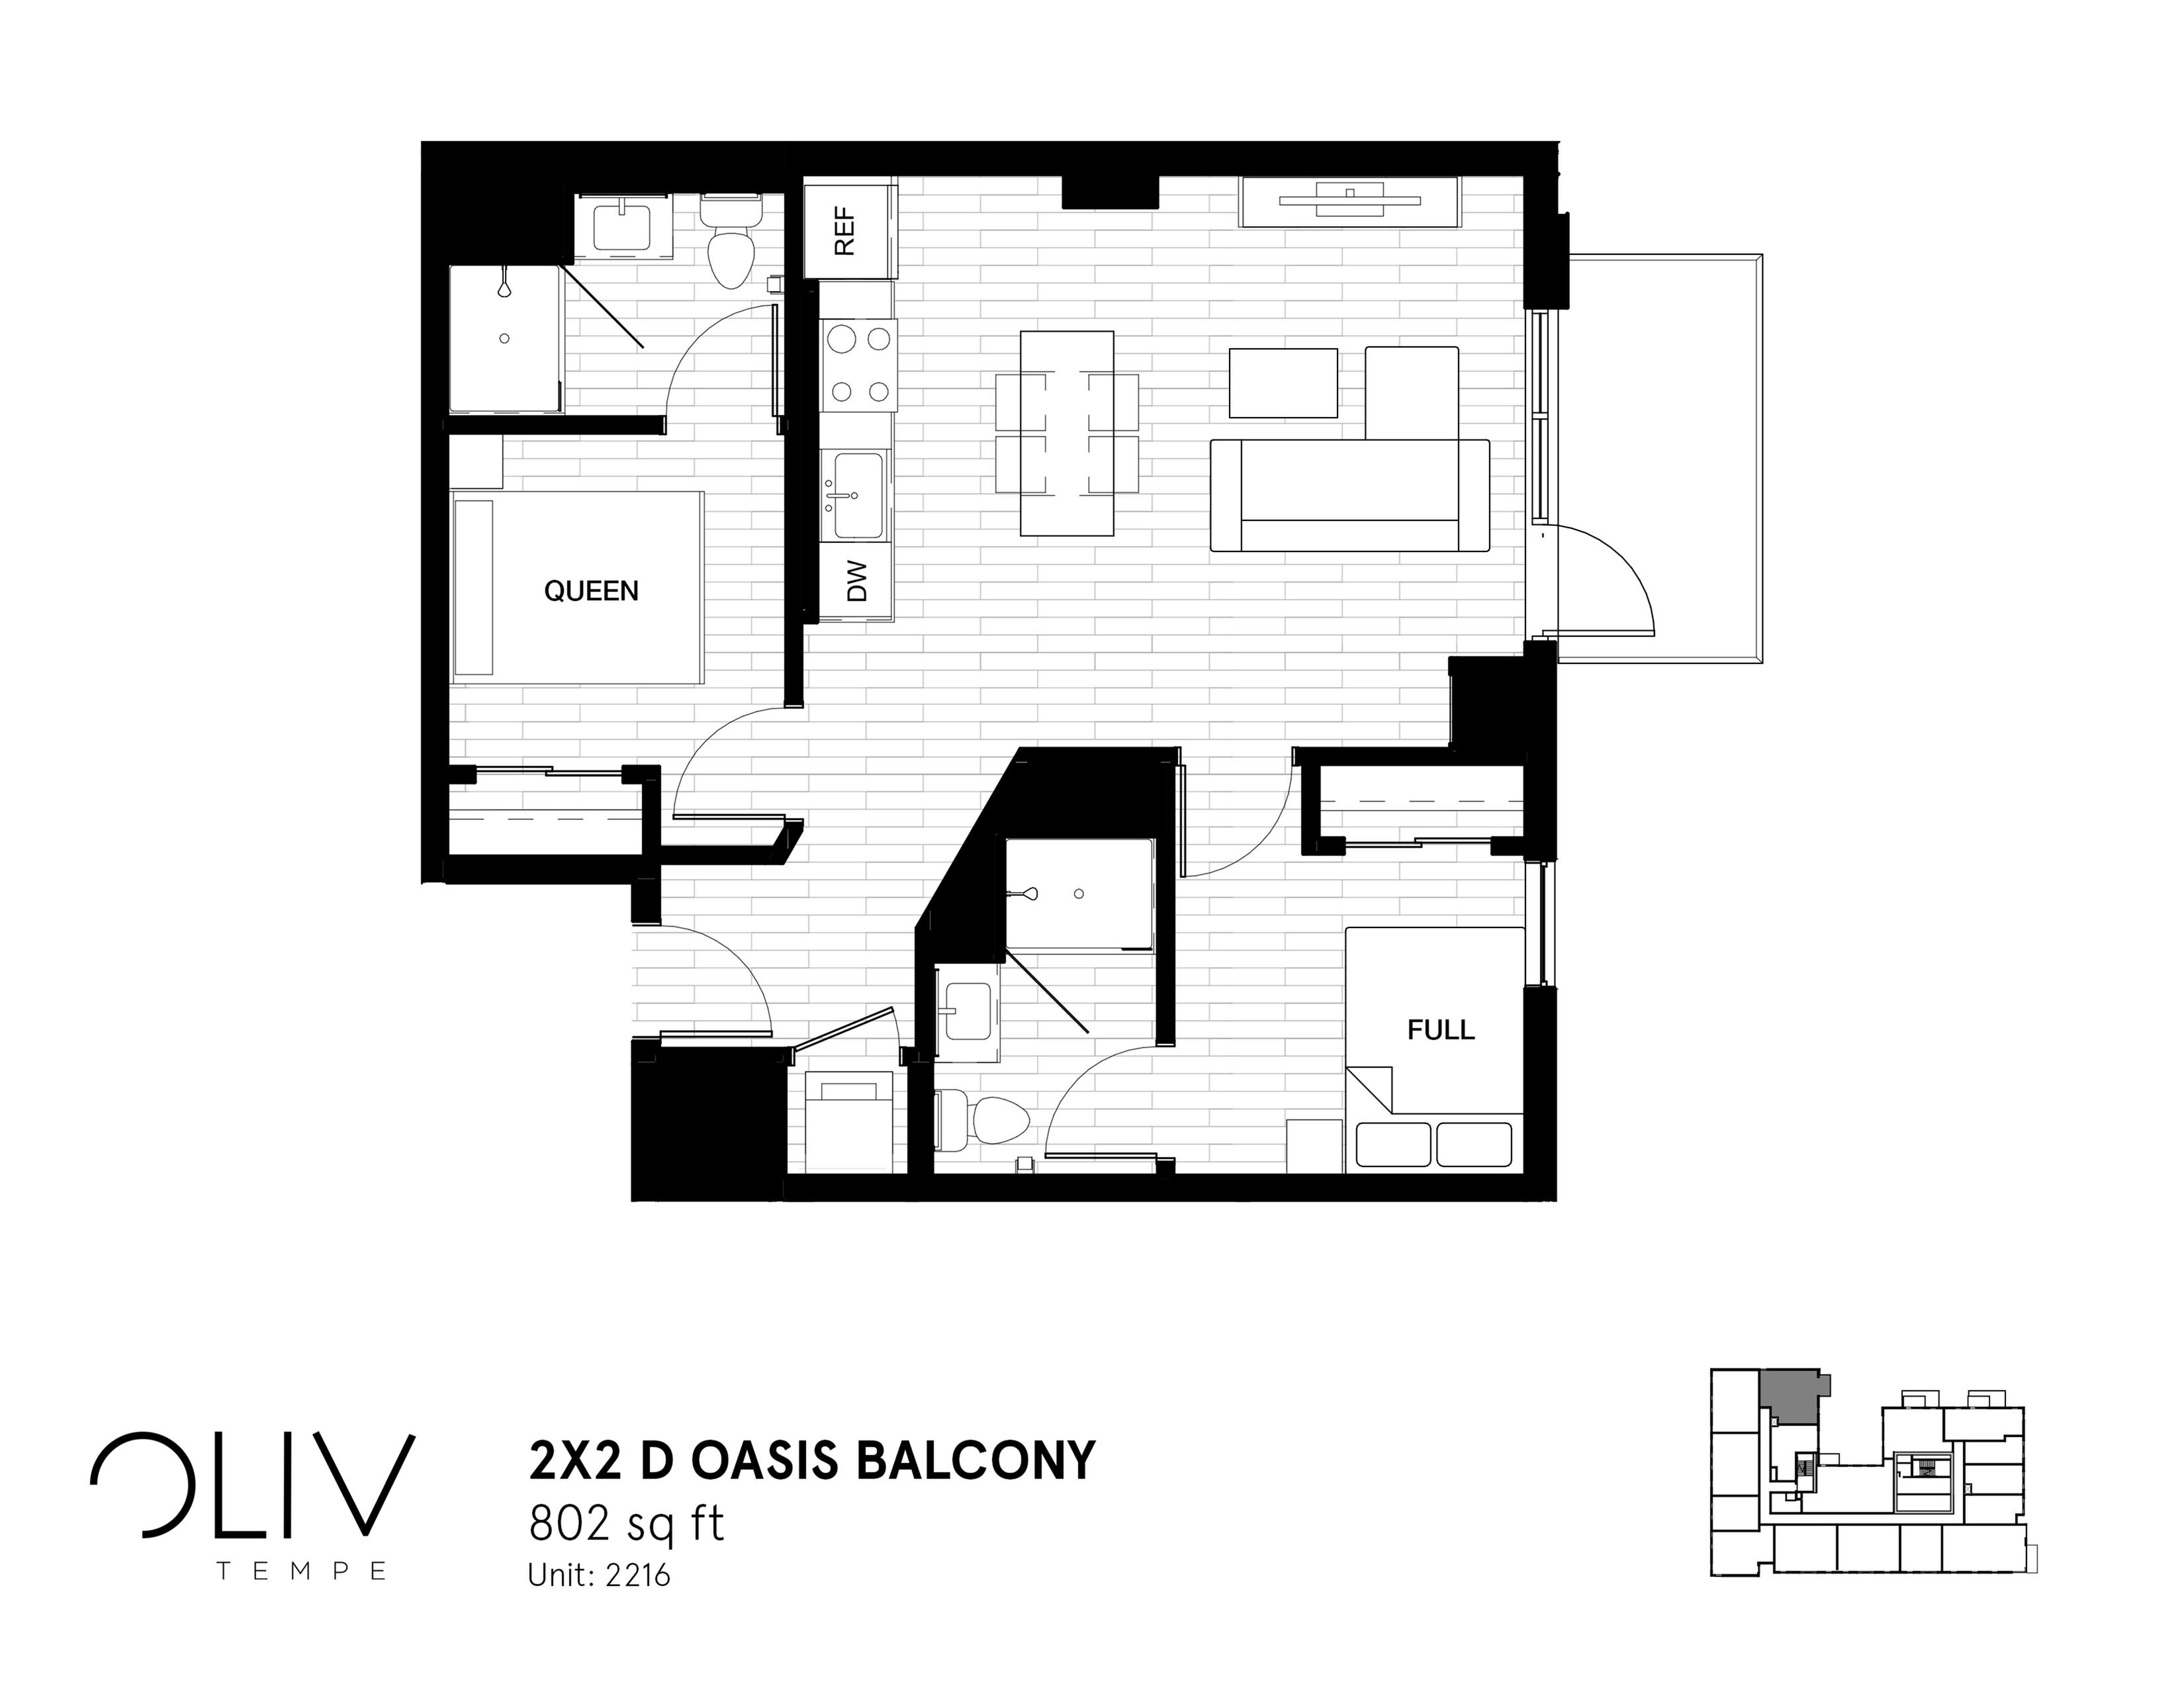 2x2 D Oasis Balcony